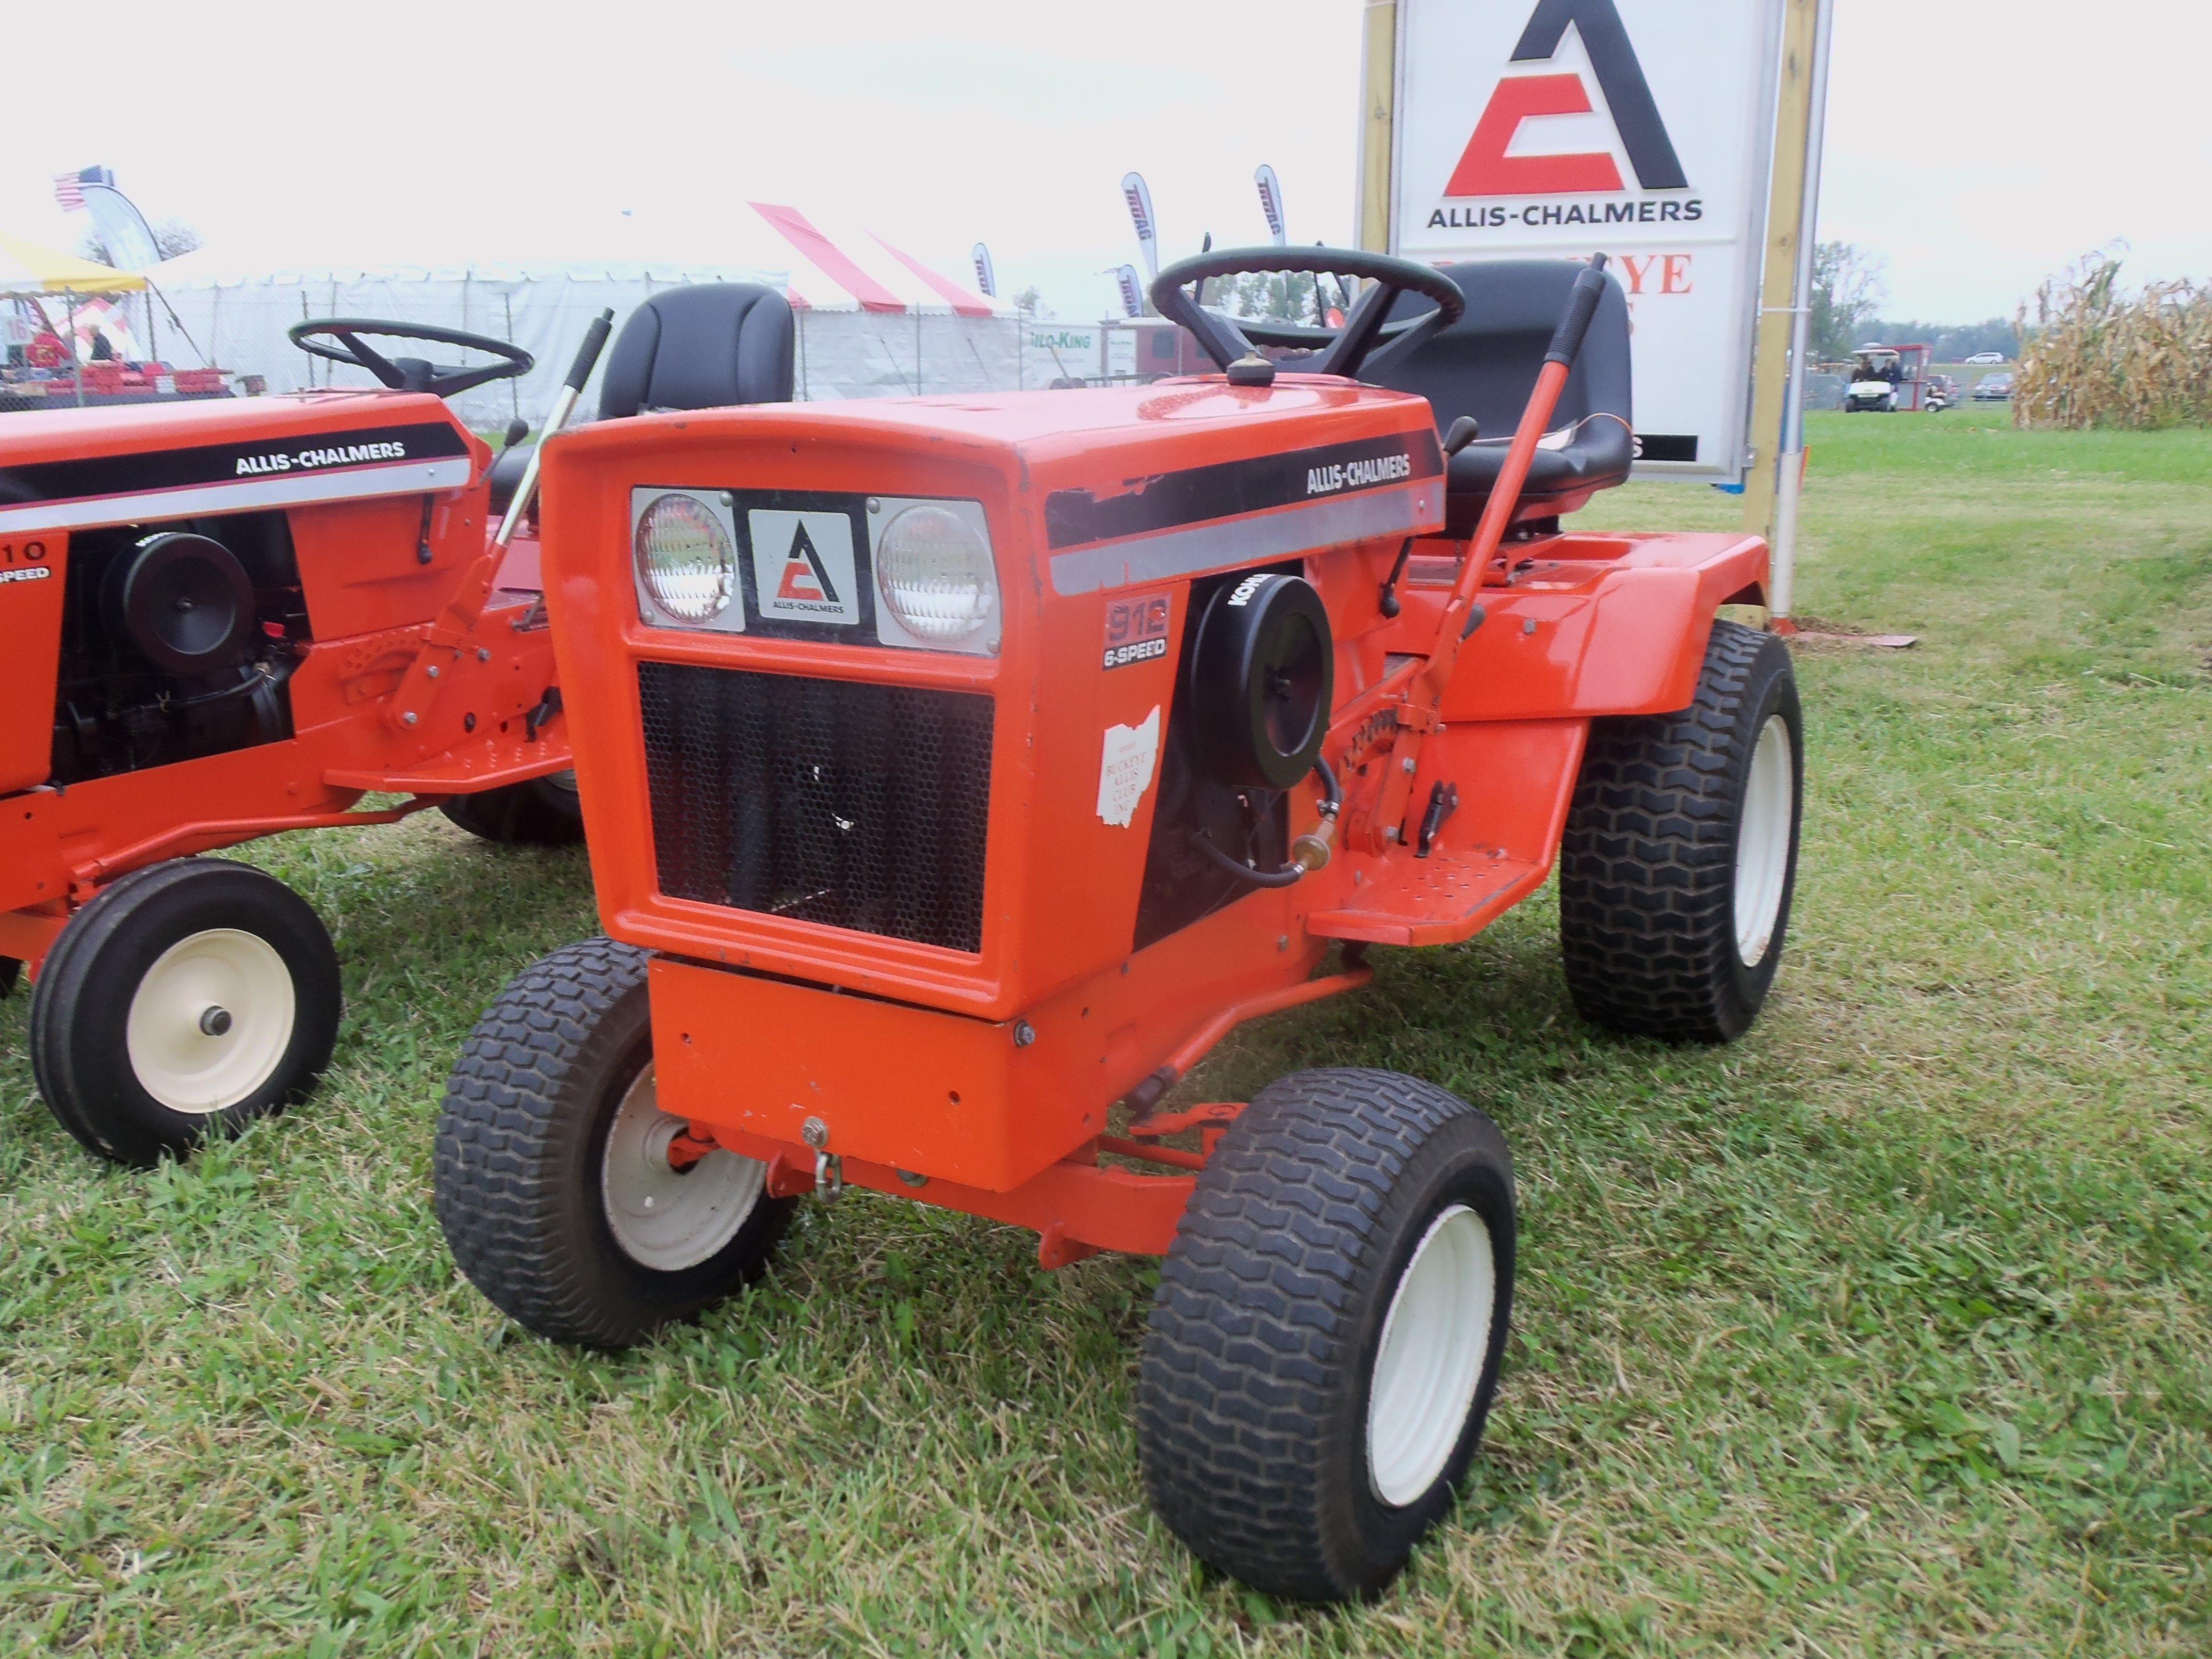 Allis Chalmers Garden Tractors : Allis chalmers pinterest tractor